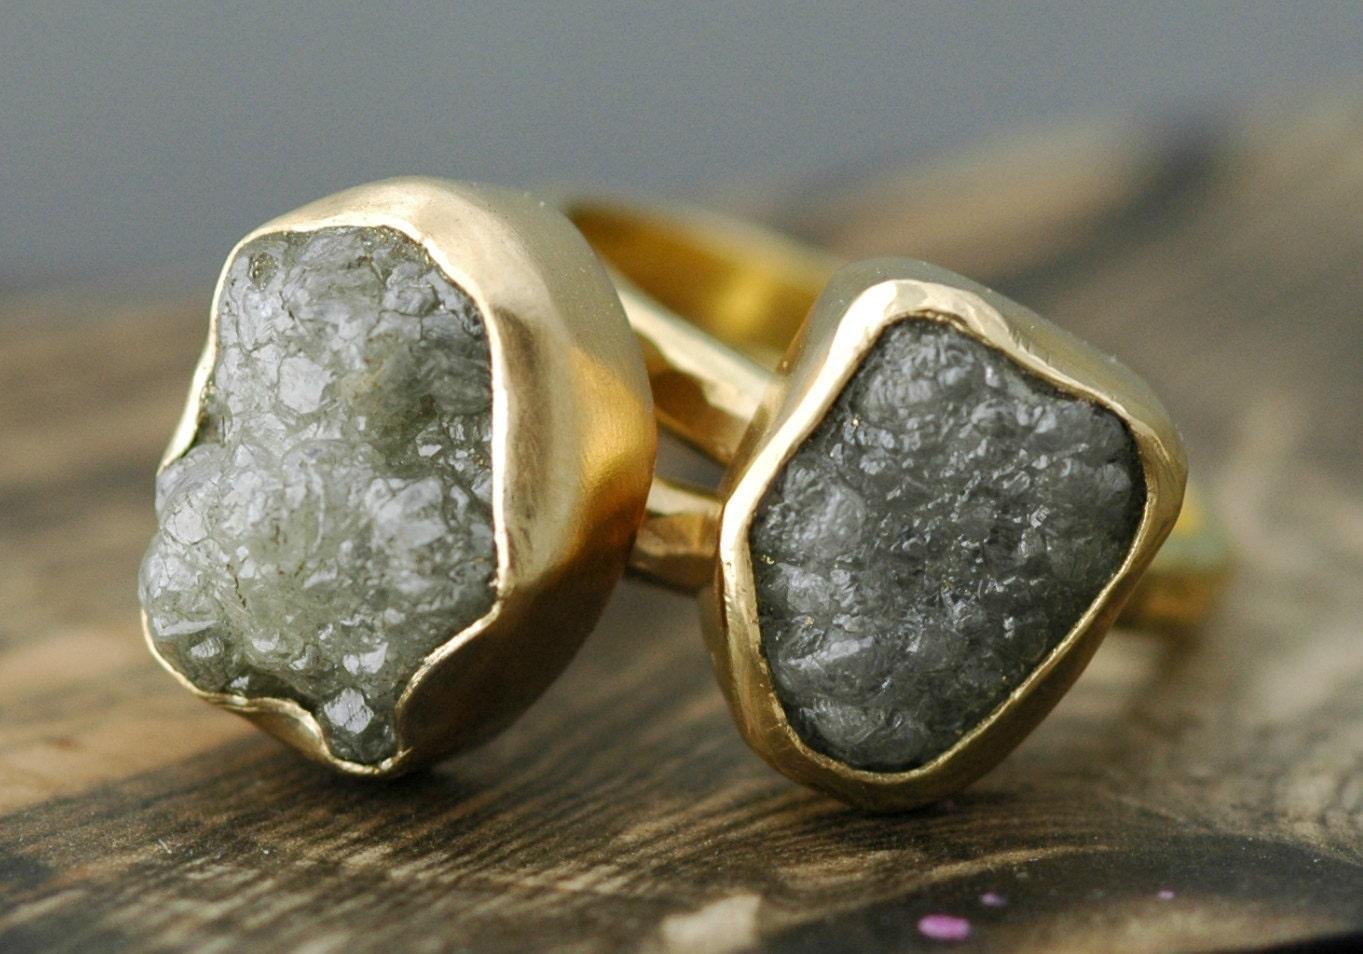 Amazoncom 14k Rose Gold Claddagh Ring Size 7 Jewelry